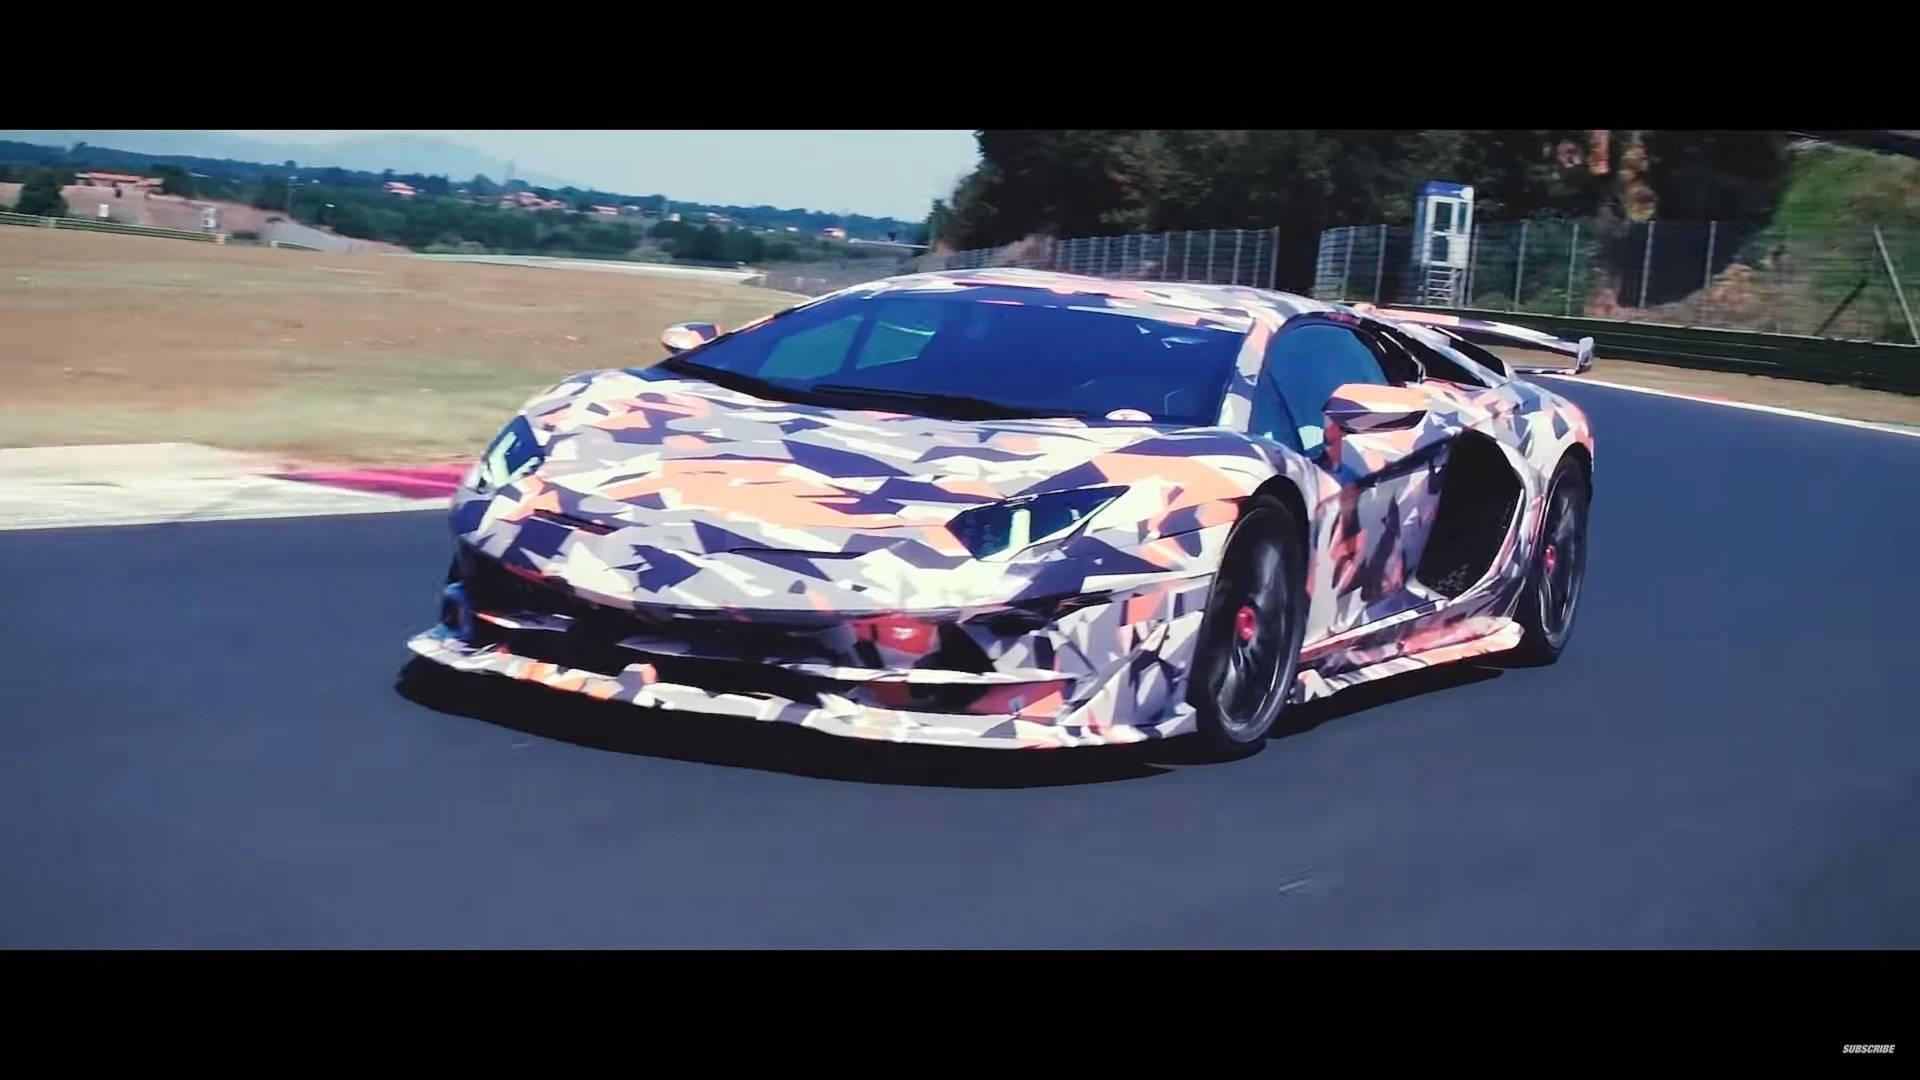 See The Lamborghini Aventador Svj Up Close In Walkaround Video